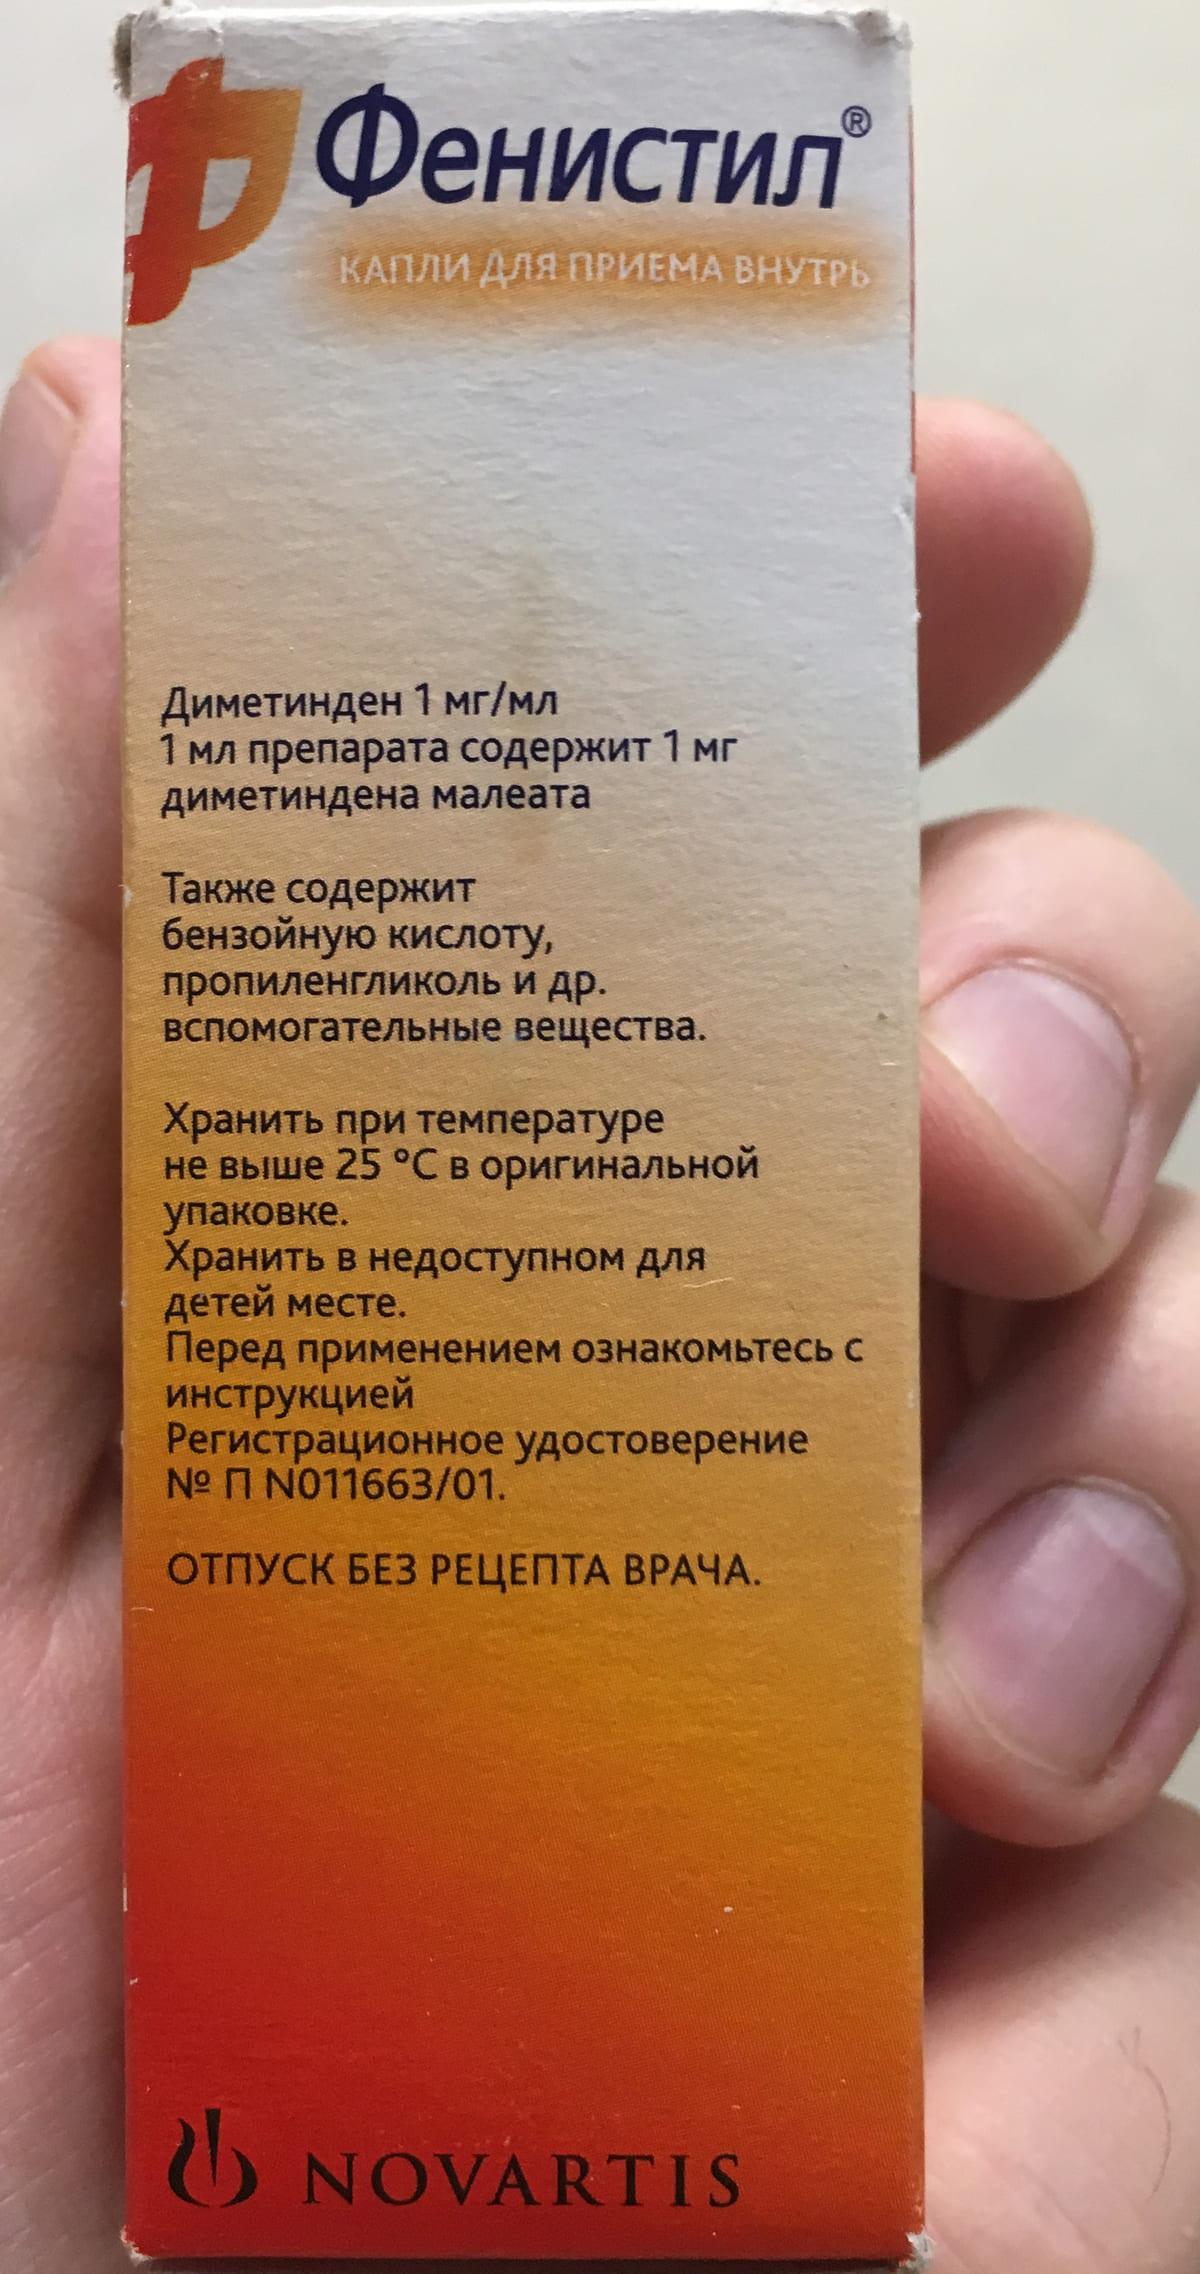 Фенистил  Фенистил fenistil 2